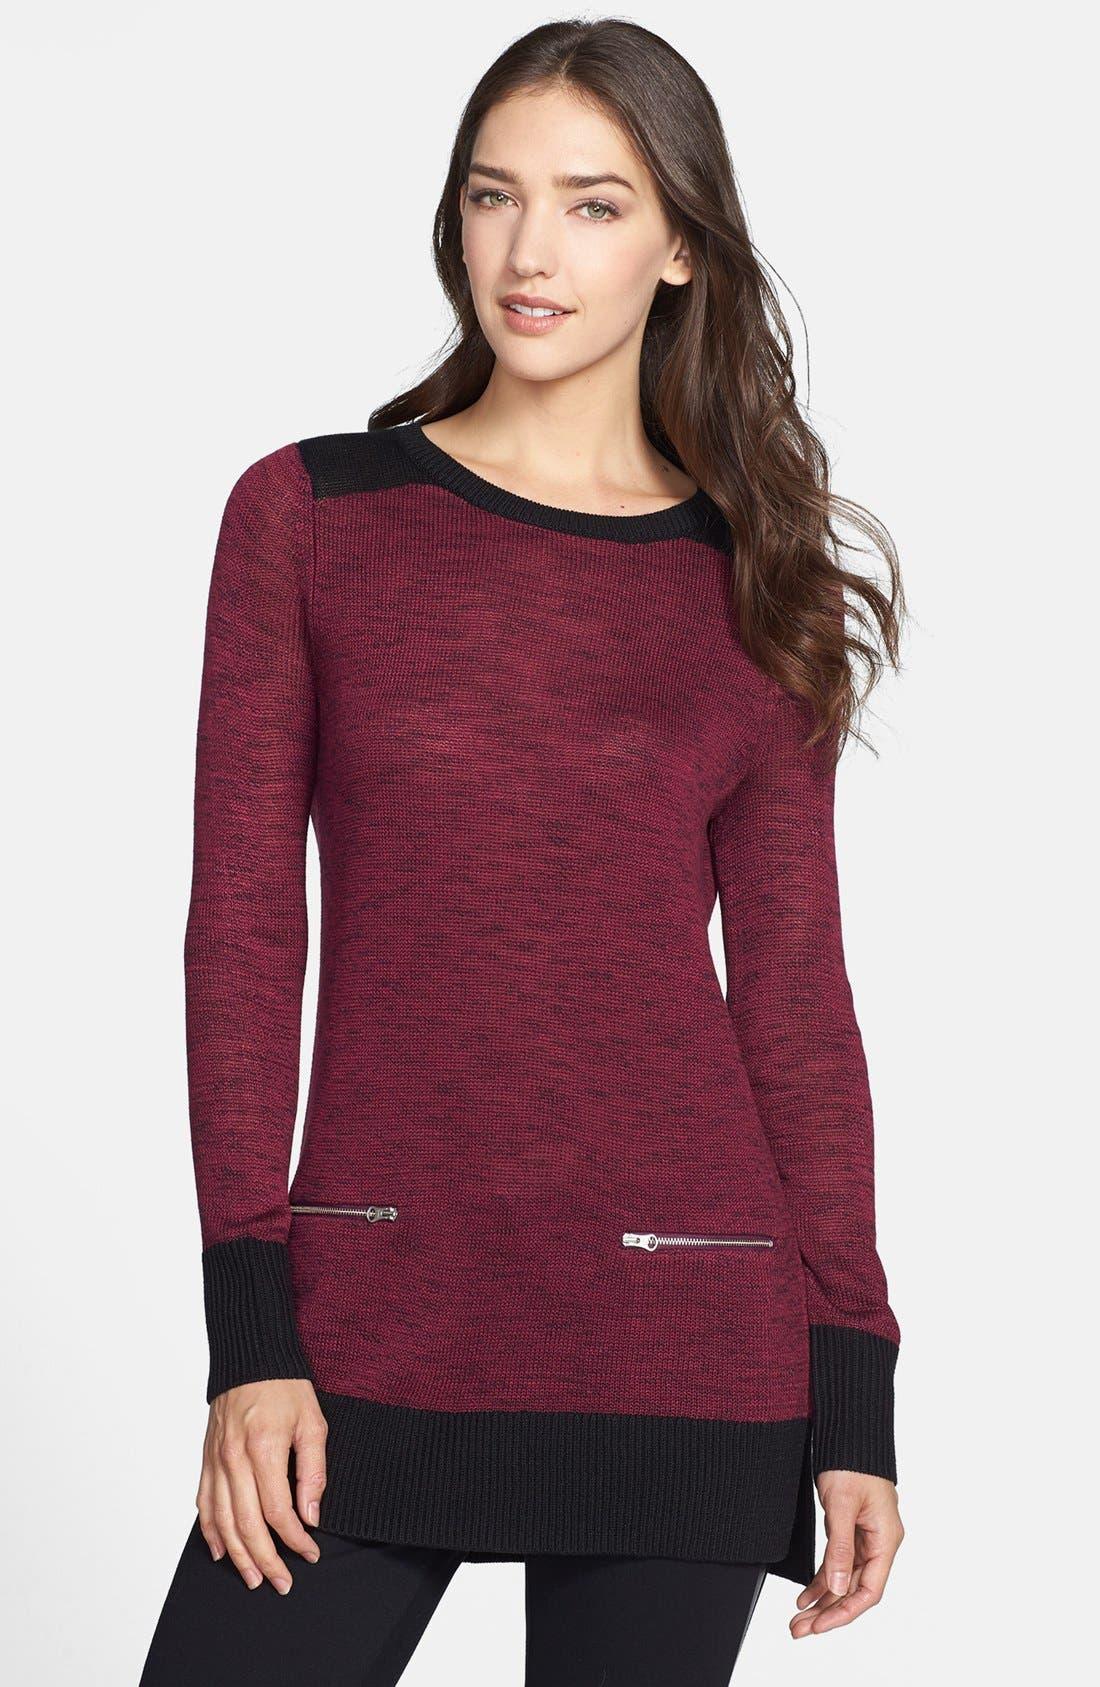 Alternate Image 1 Selected - Halogen® Zip Pocket Tunic Sweater (Regular & Petite Focus)